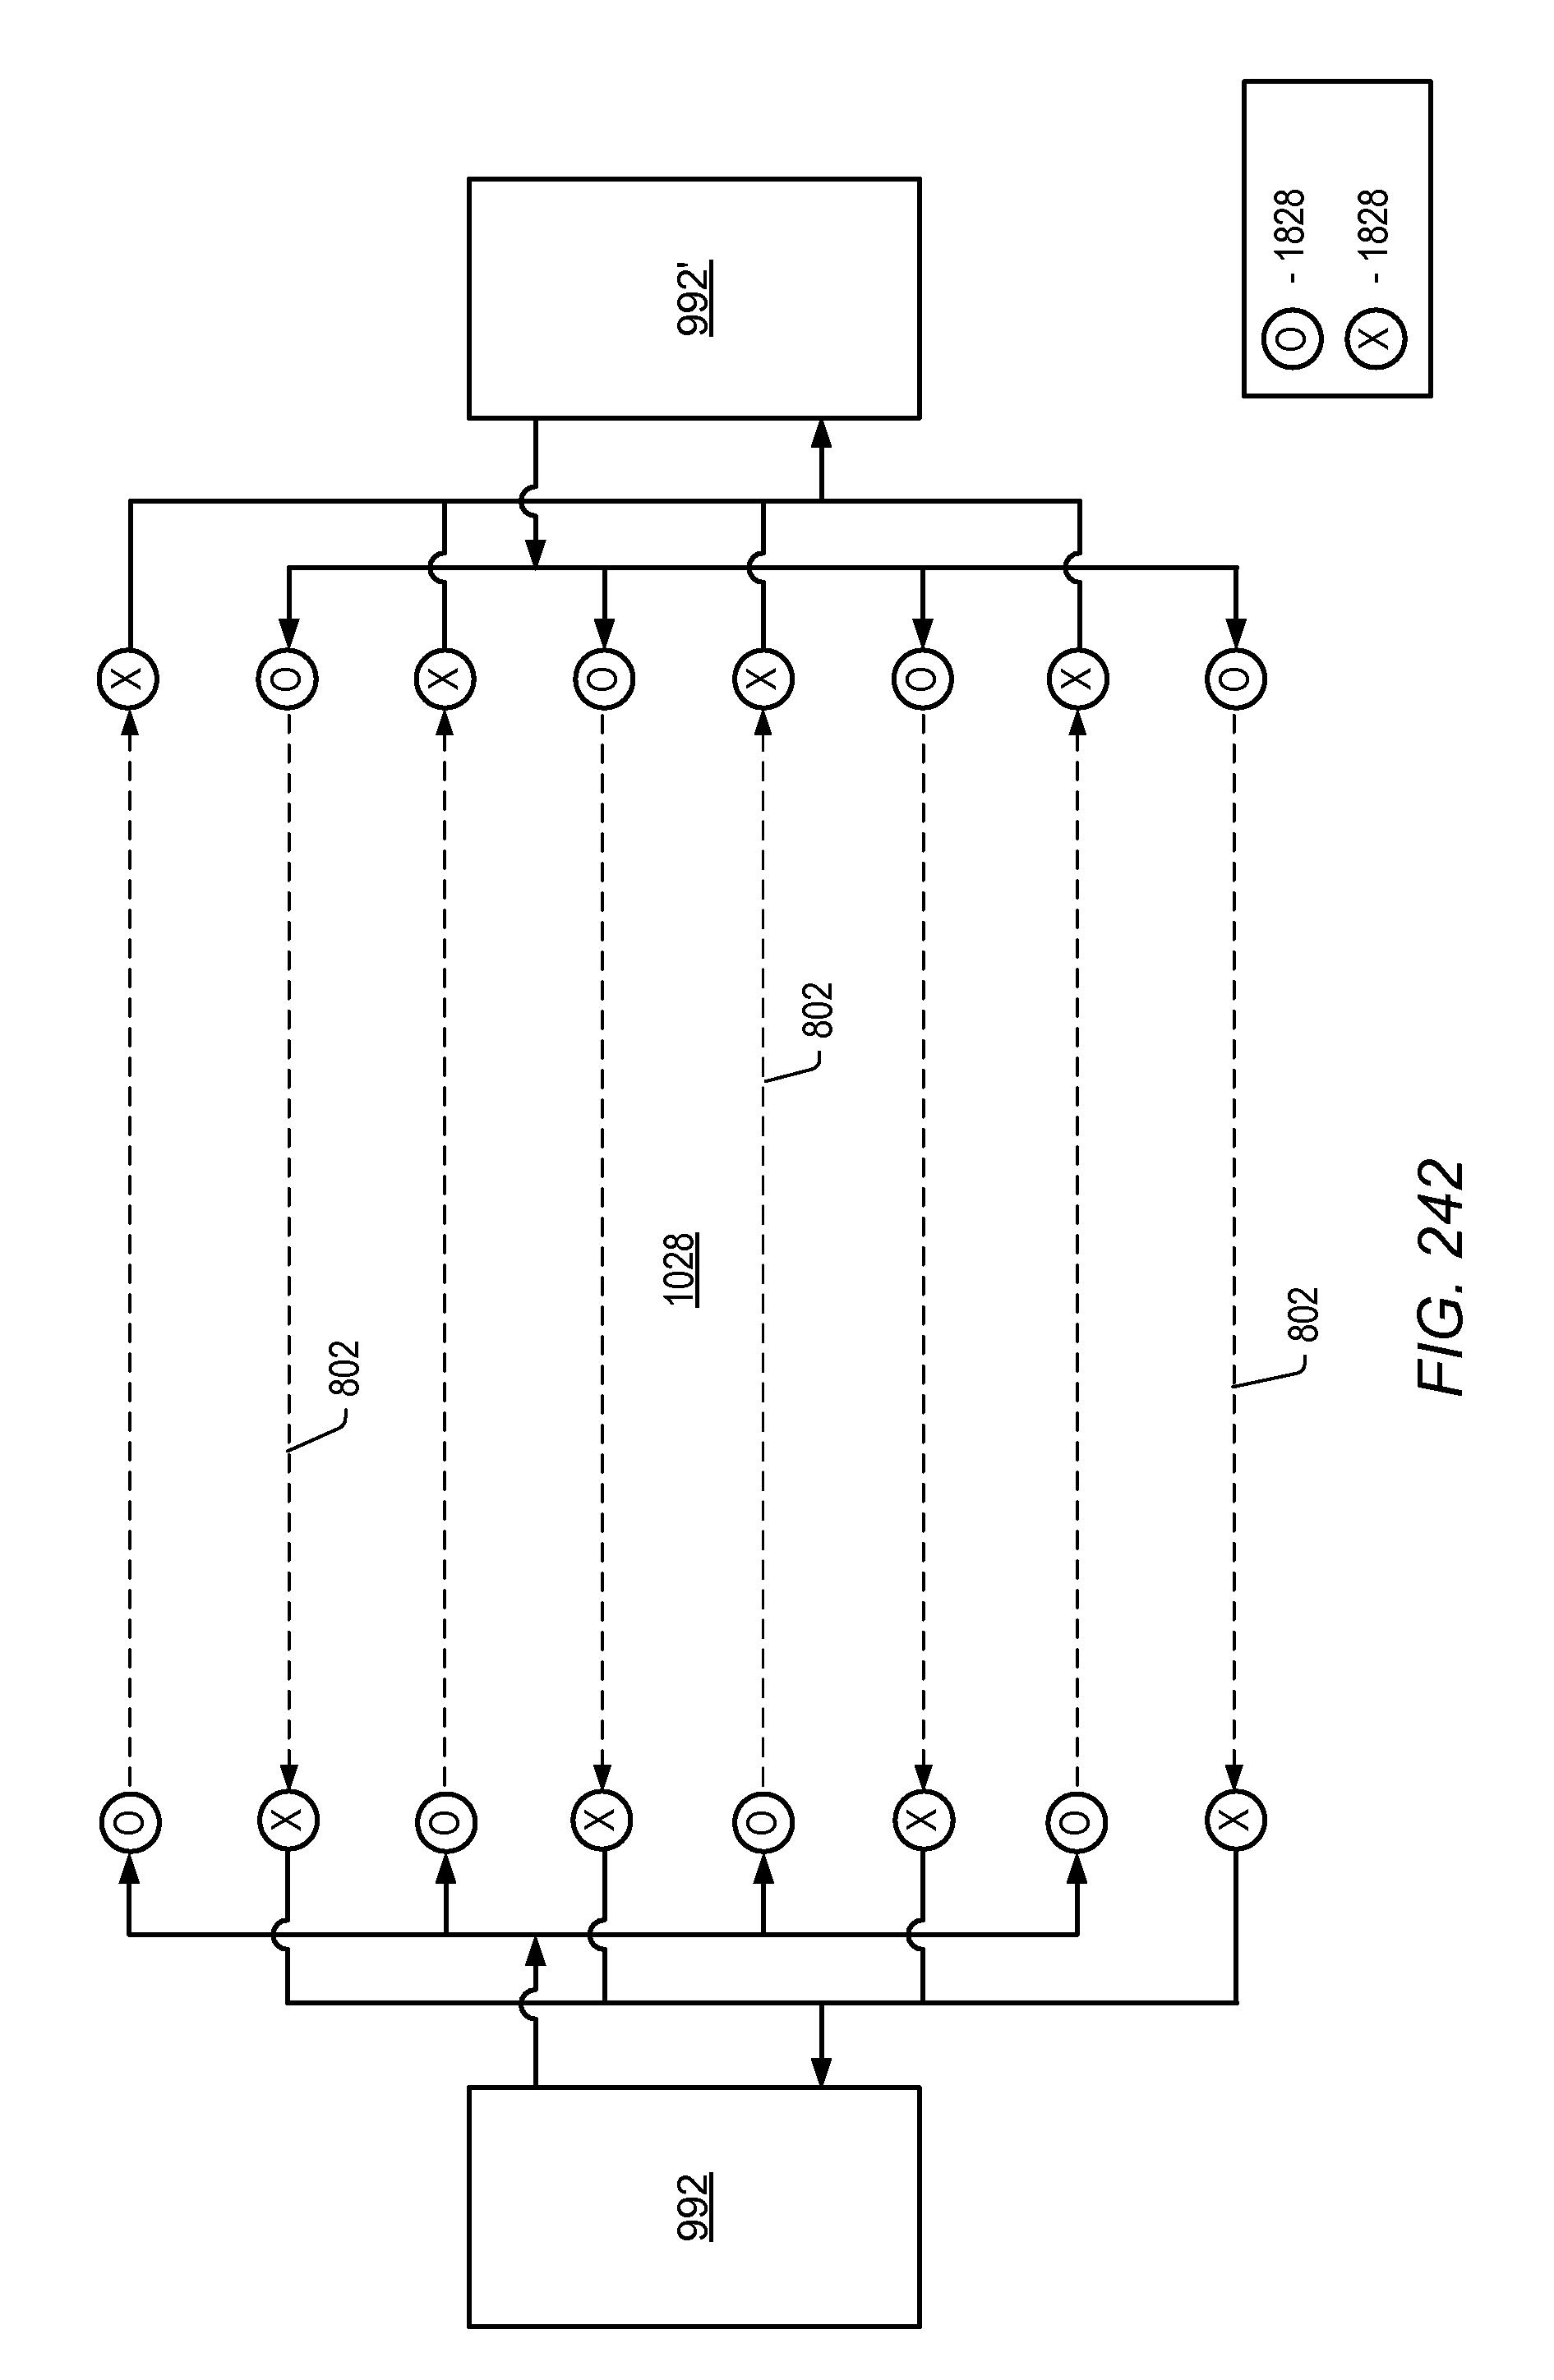 Patent US 8,011,451 B2